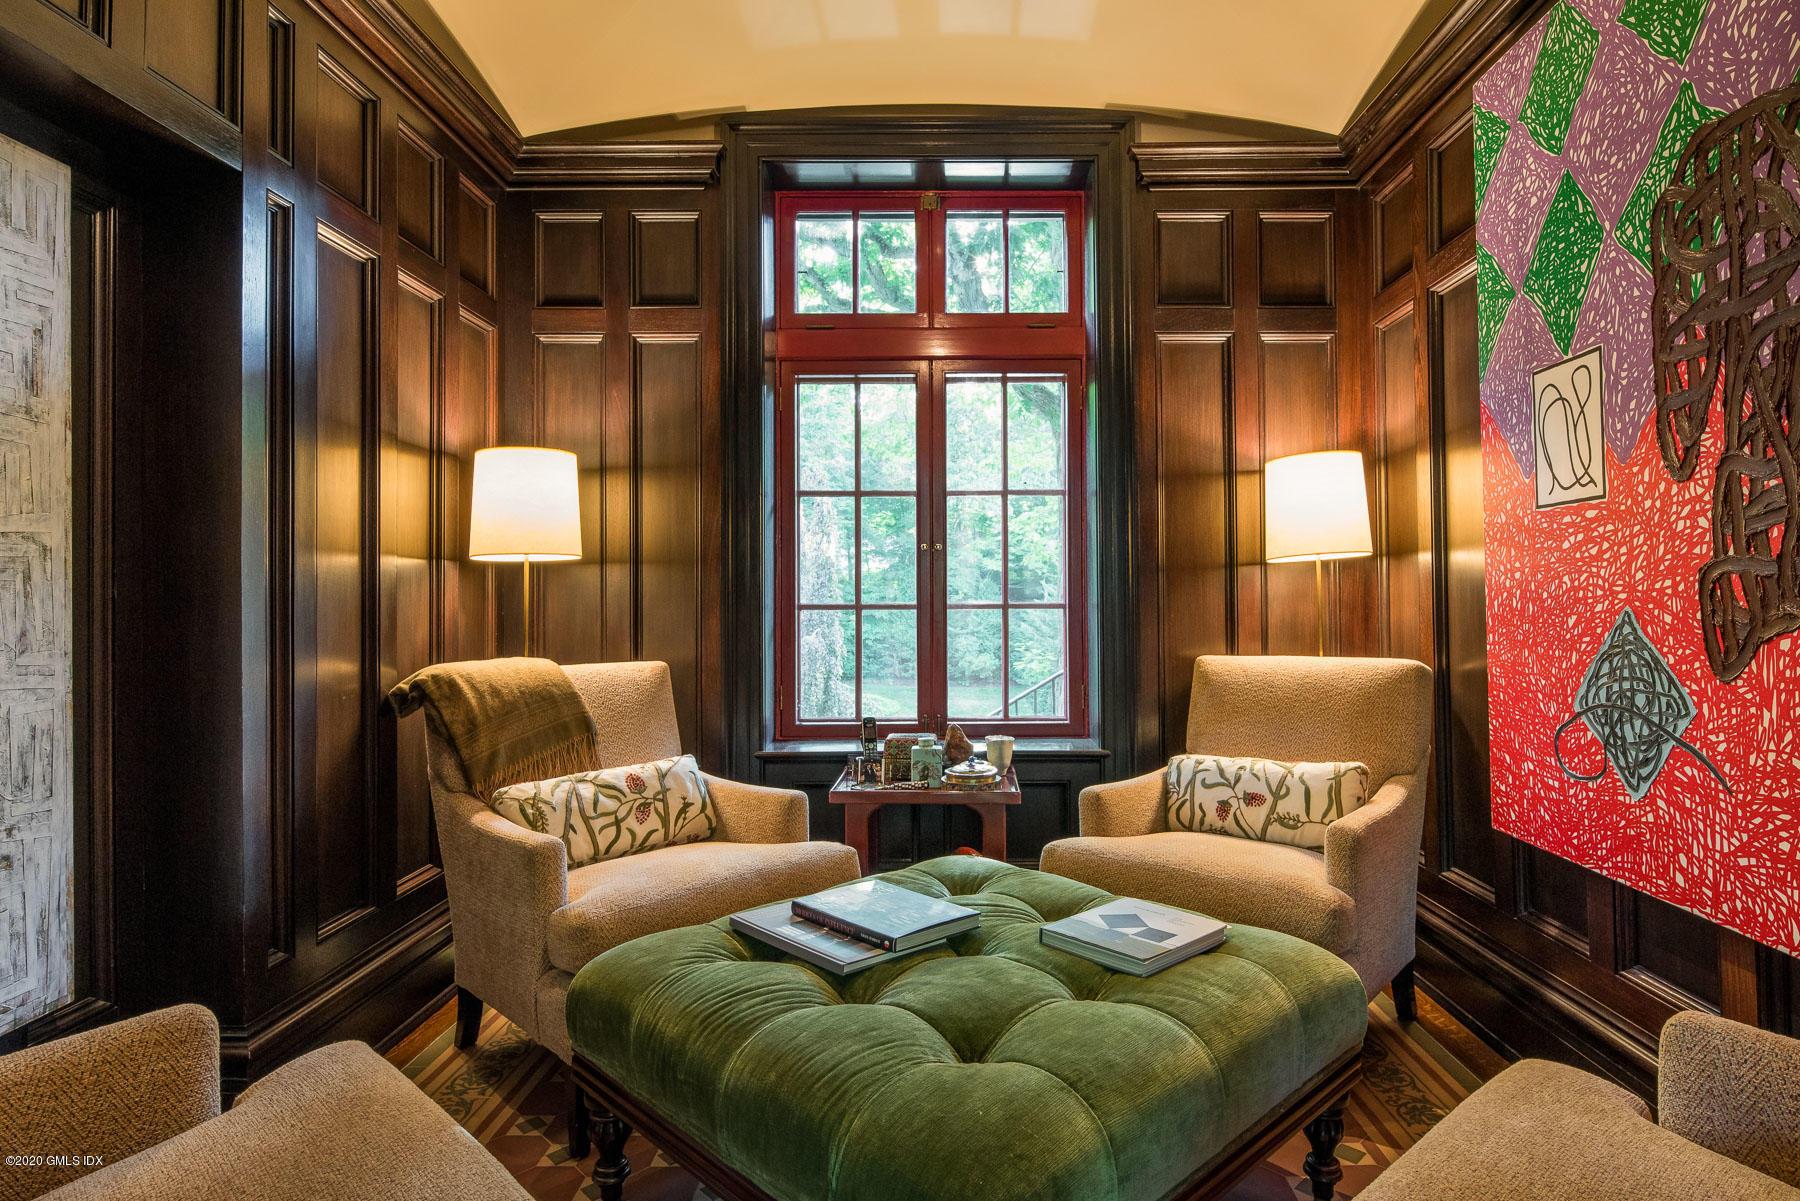 67 Pecksland Road, Greenwich, Connecticut 06831, 6 Bedrooms Bedrooms, ,7 BathroomsBathrooms,Single family,For sale,Pecksland,110488